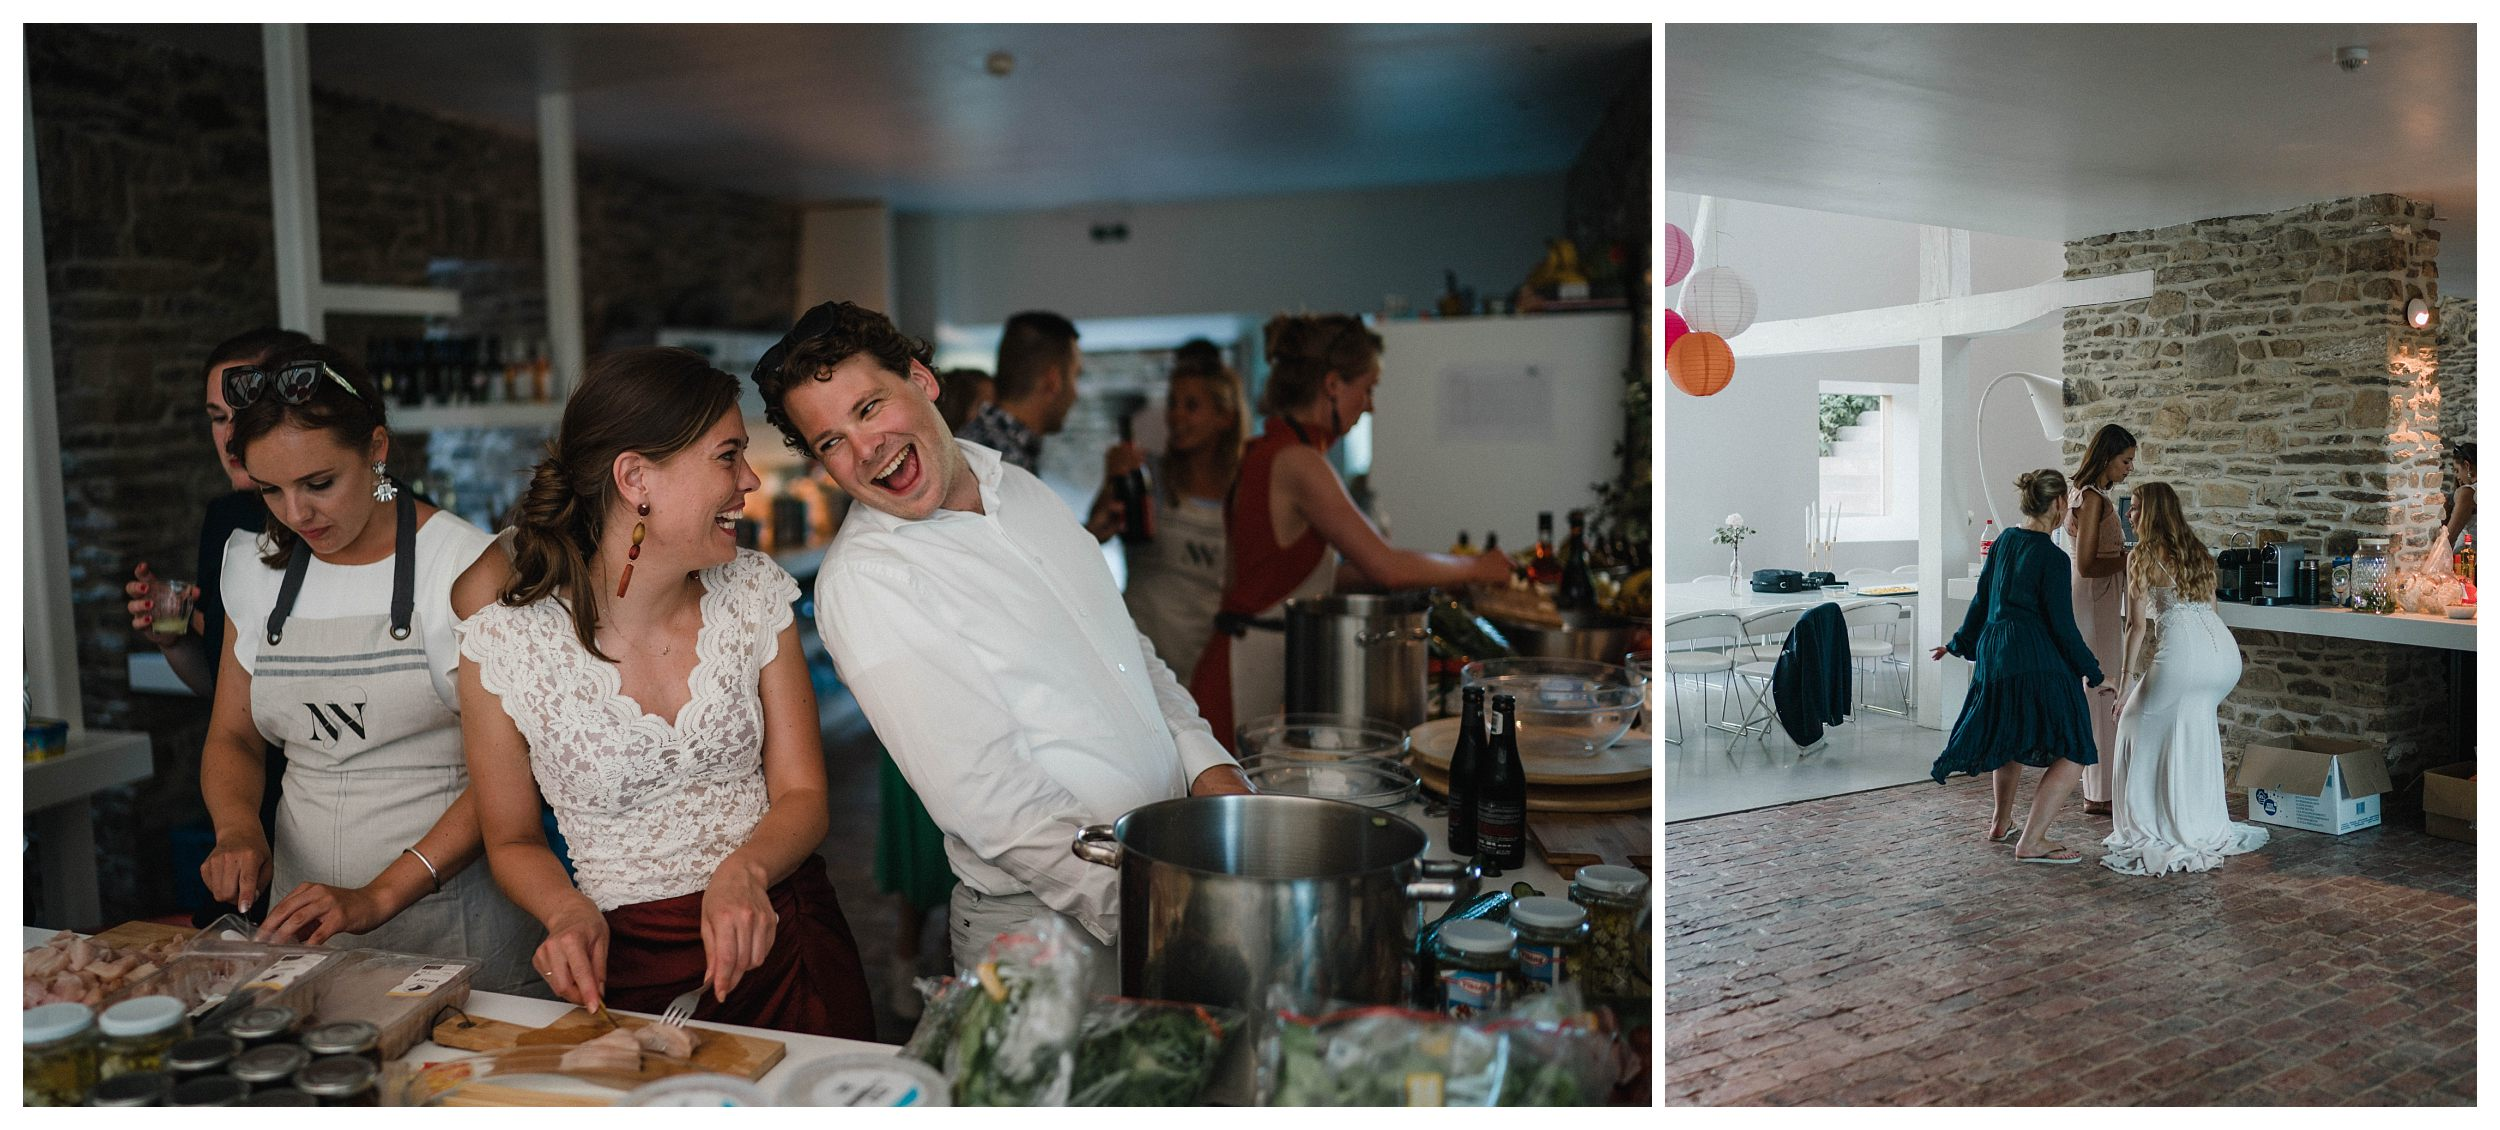 huwelijksfotograaf bruidsfotograaf destinationwedding huwelijksfotografie in ardennen nederland (85).jpg